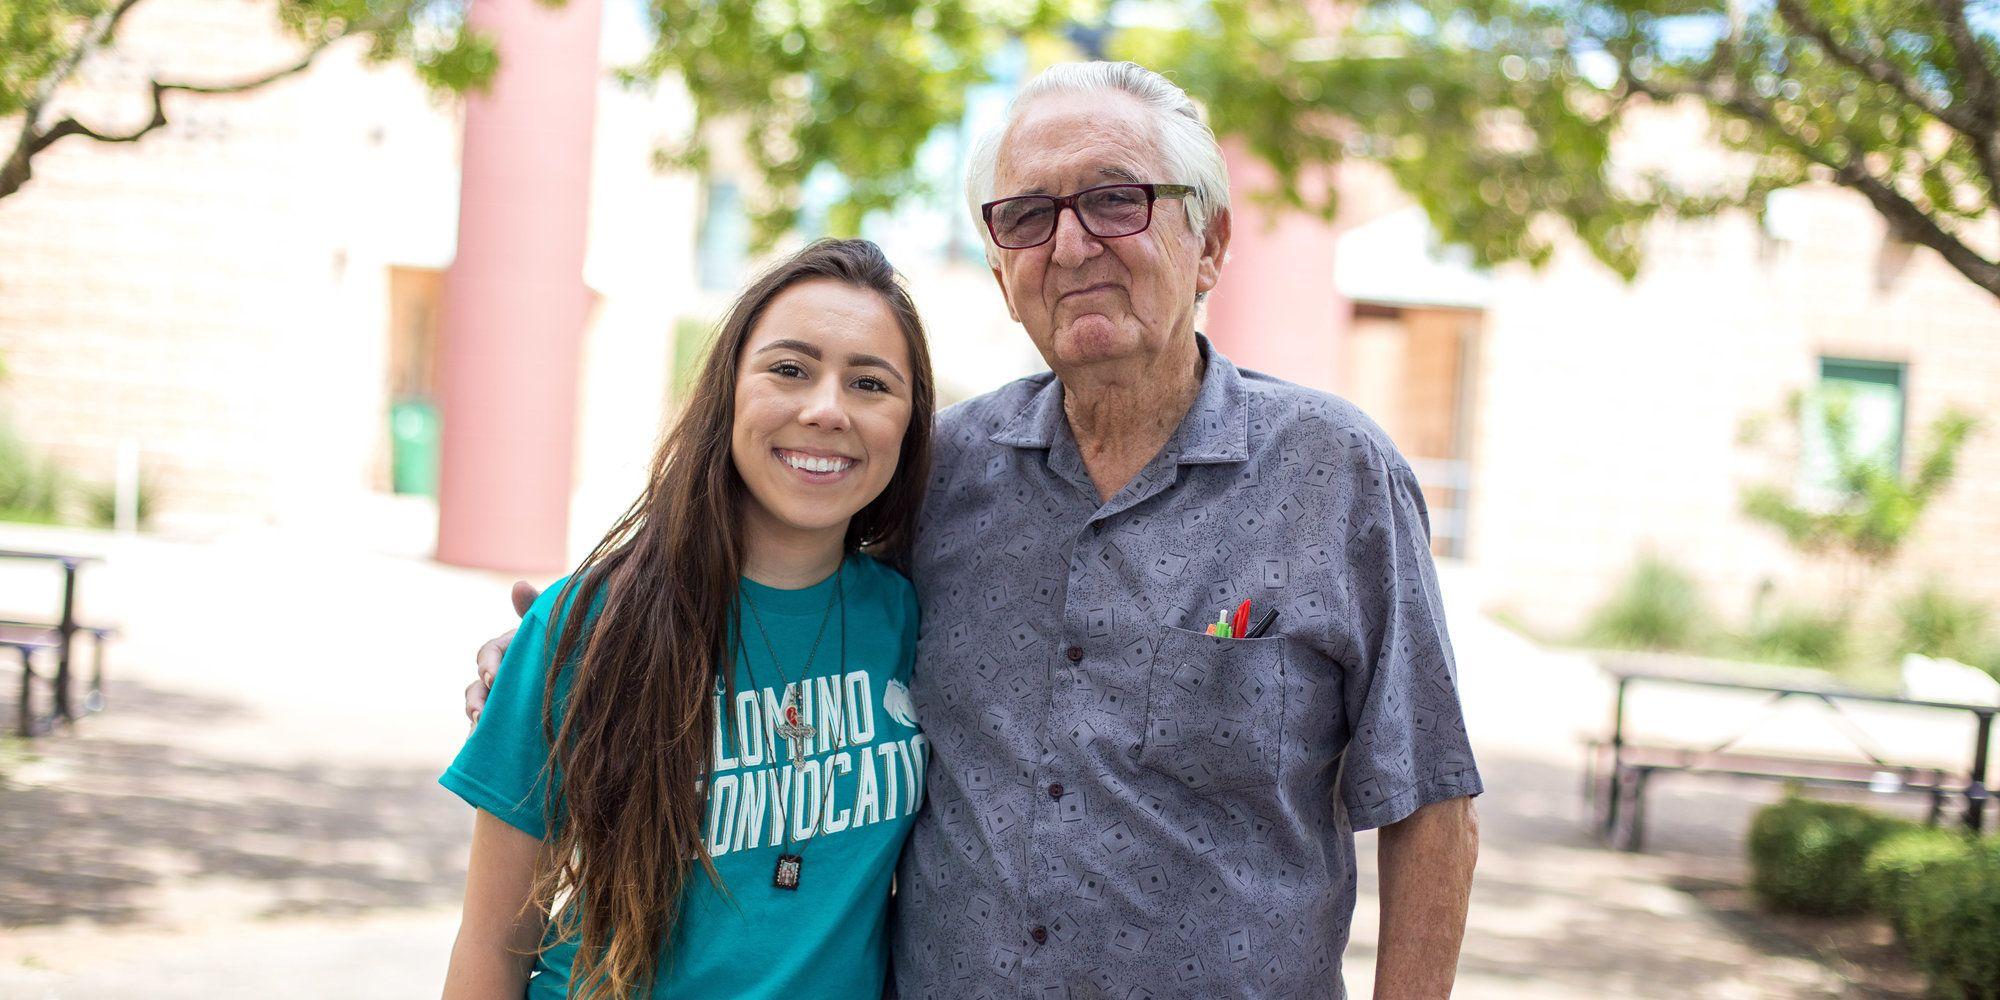 grandpa_collegestudent.jpg